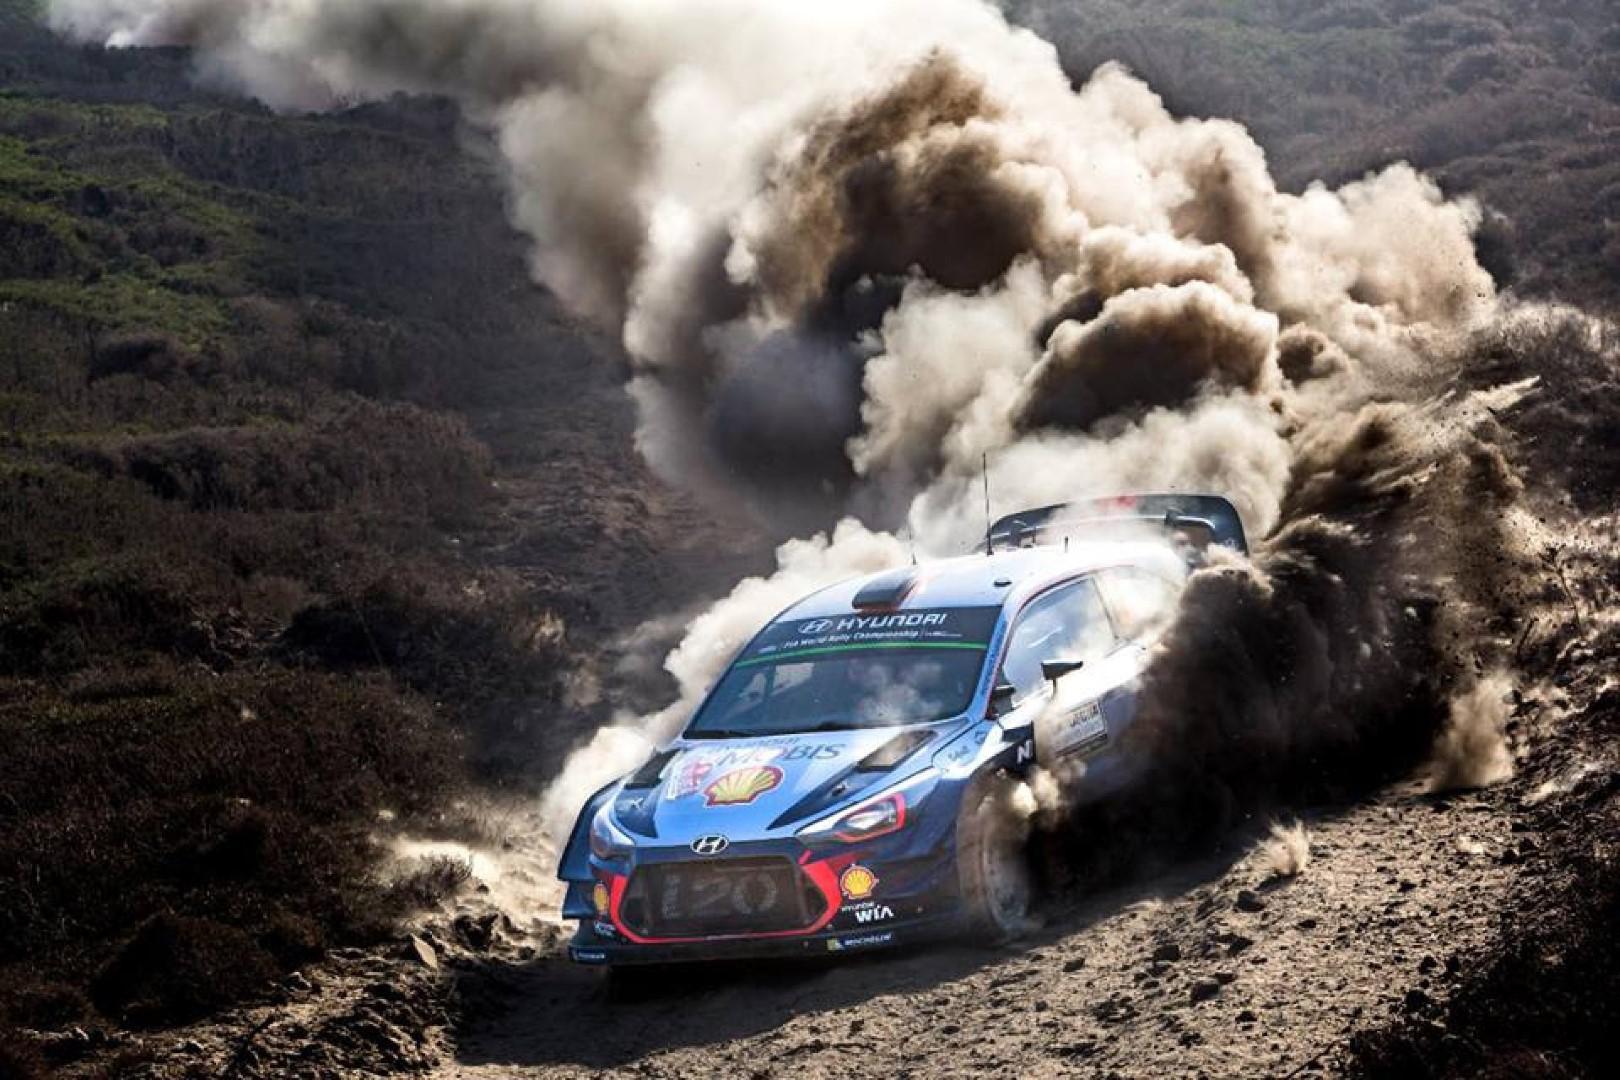 Rallye d'australie 2017 : Neuville s'offre le shakedown